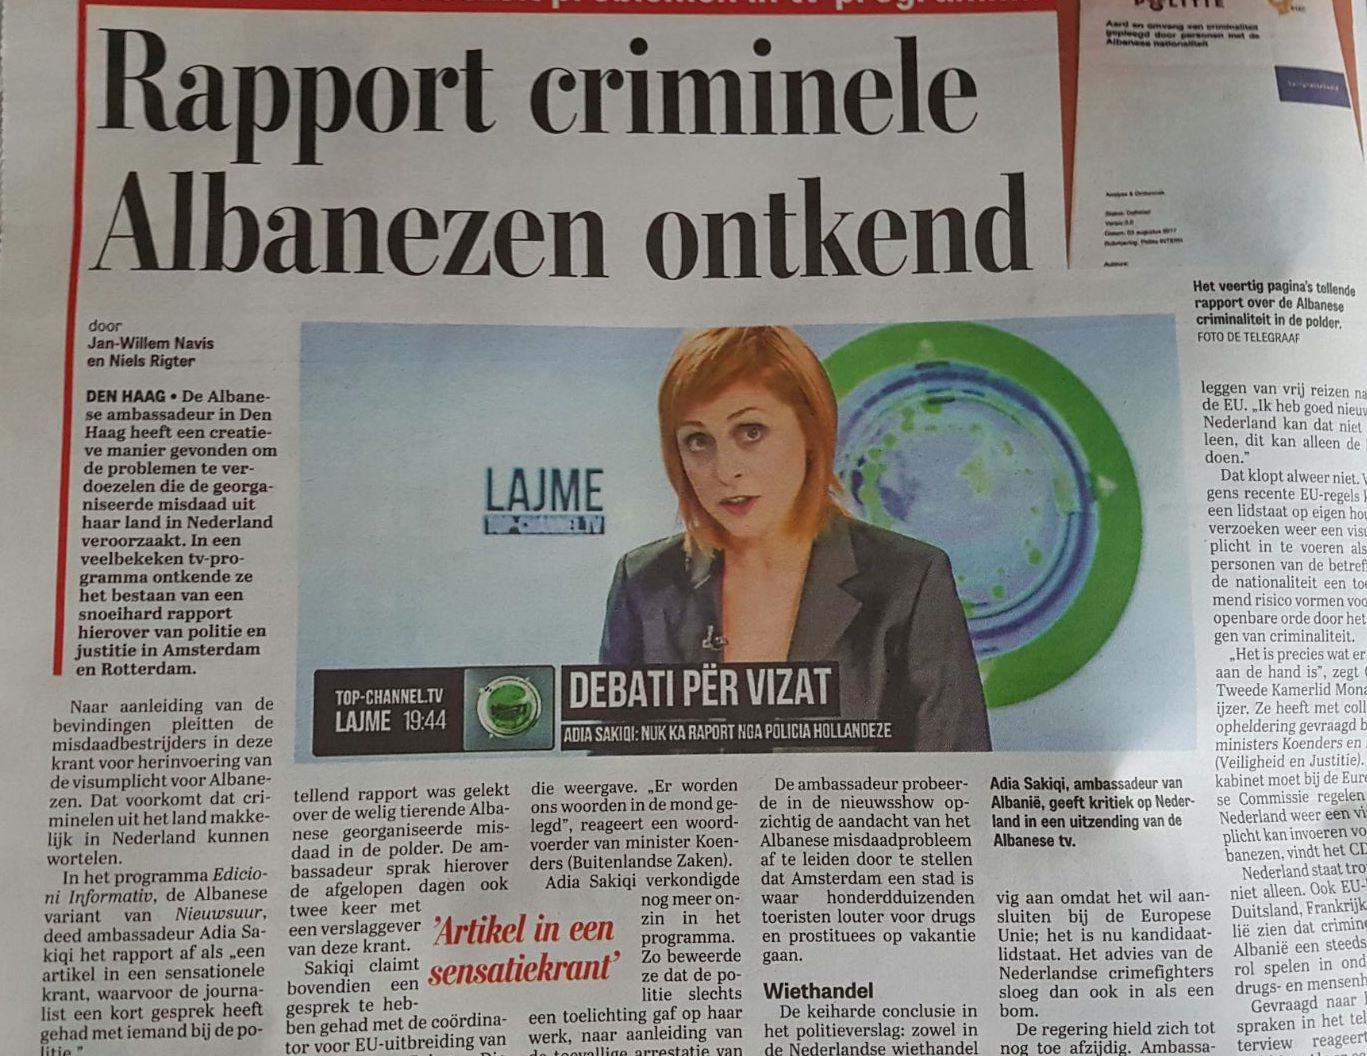 Gazeta holandeze: Ambasadorja shqiptare flet marrëzira!